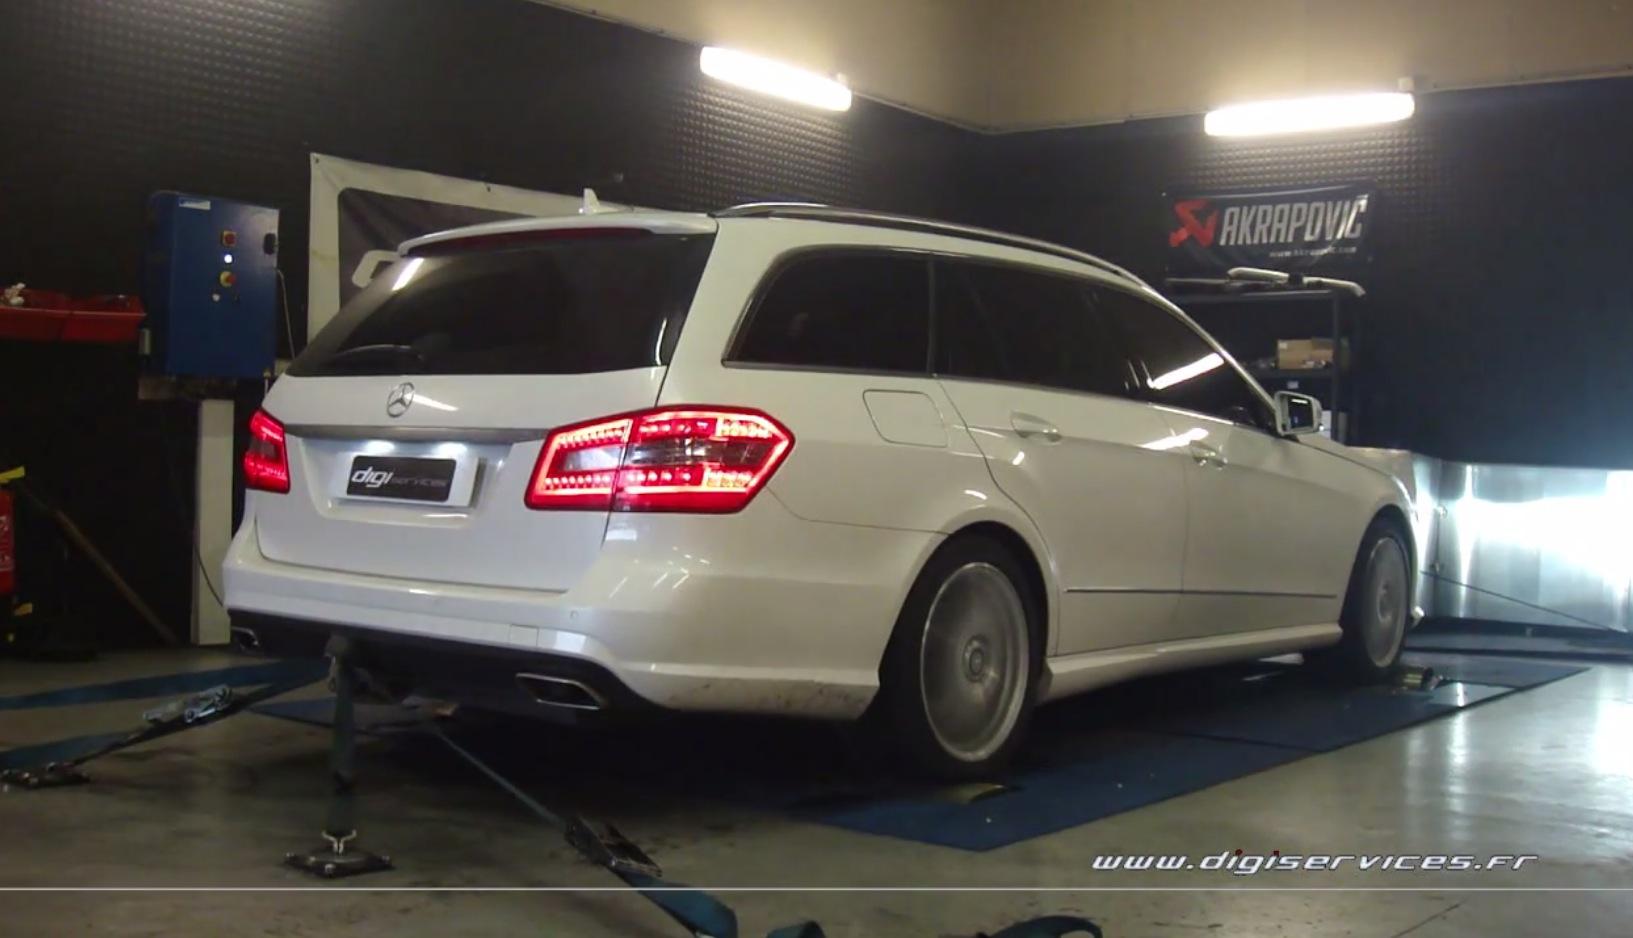 E 350 Cdi S212 Wagon Gets 313 Hp Via Chip Tuning